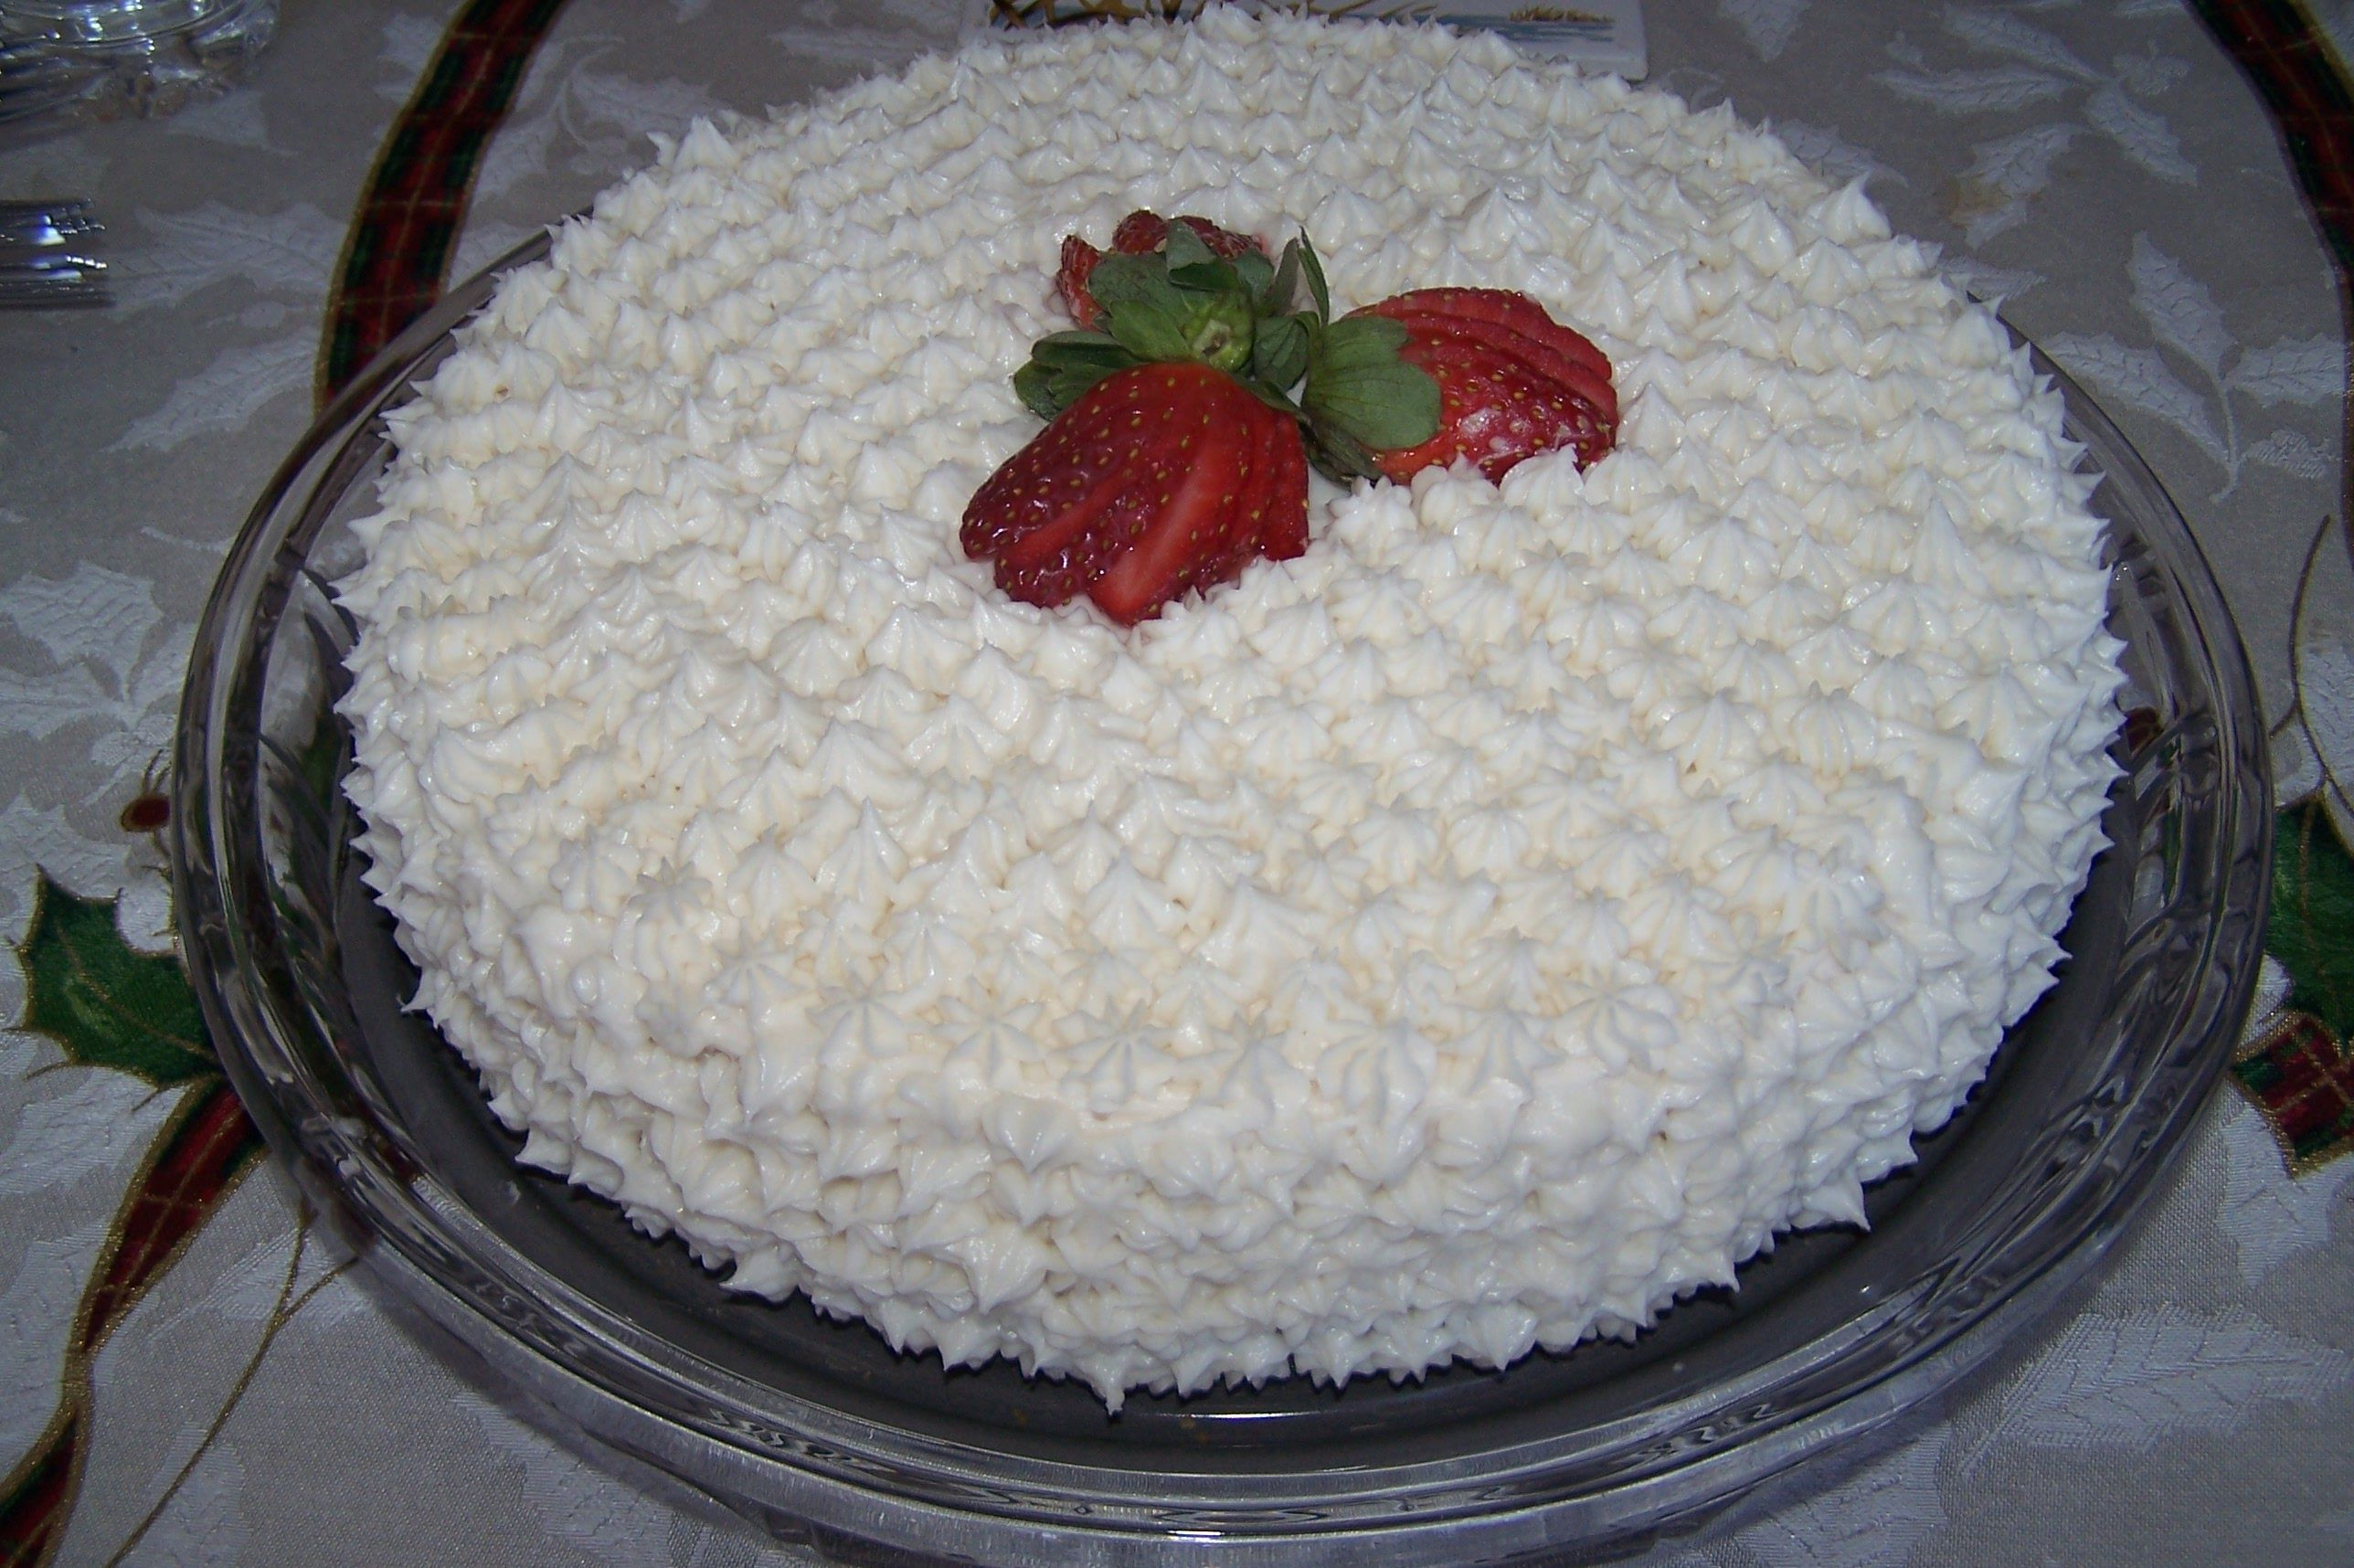 Strawberry Cheesecake, Icing, White, Strawberry, Decorate, HQ Photo